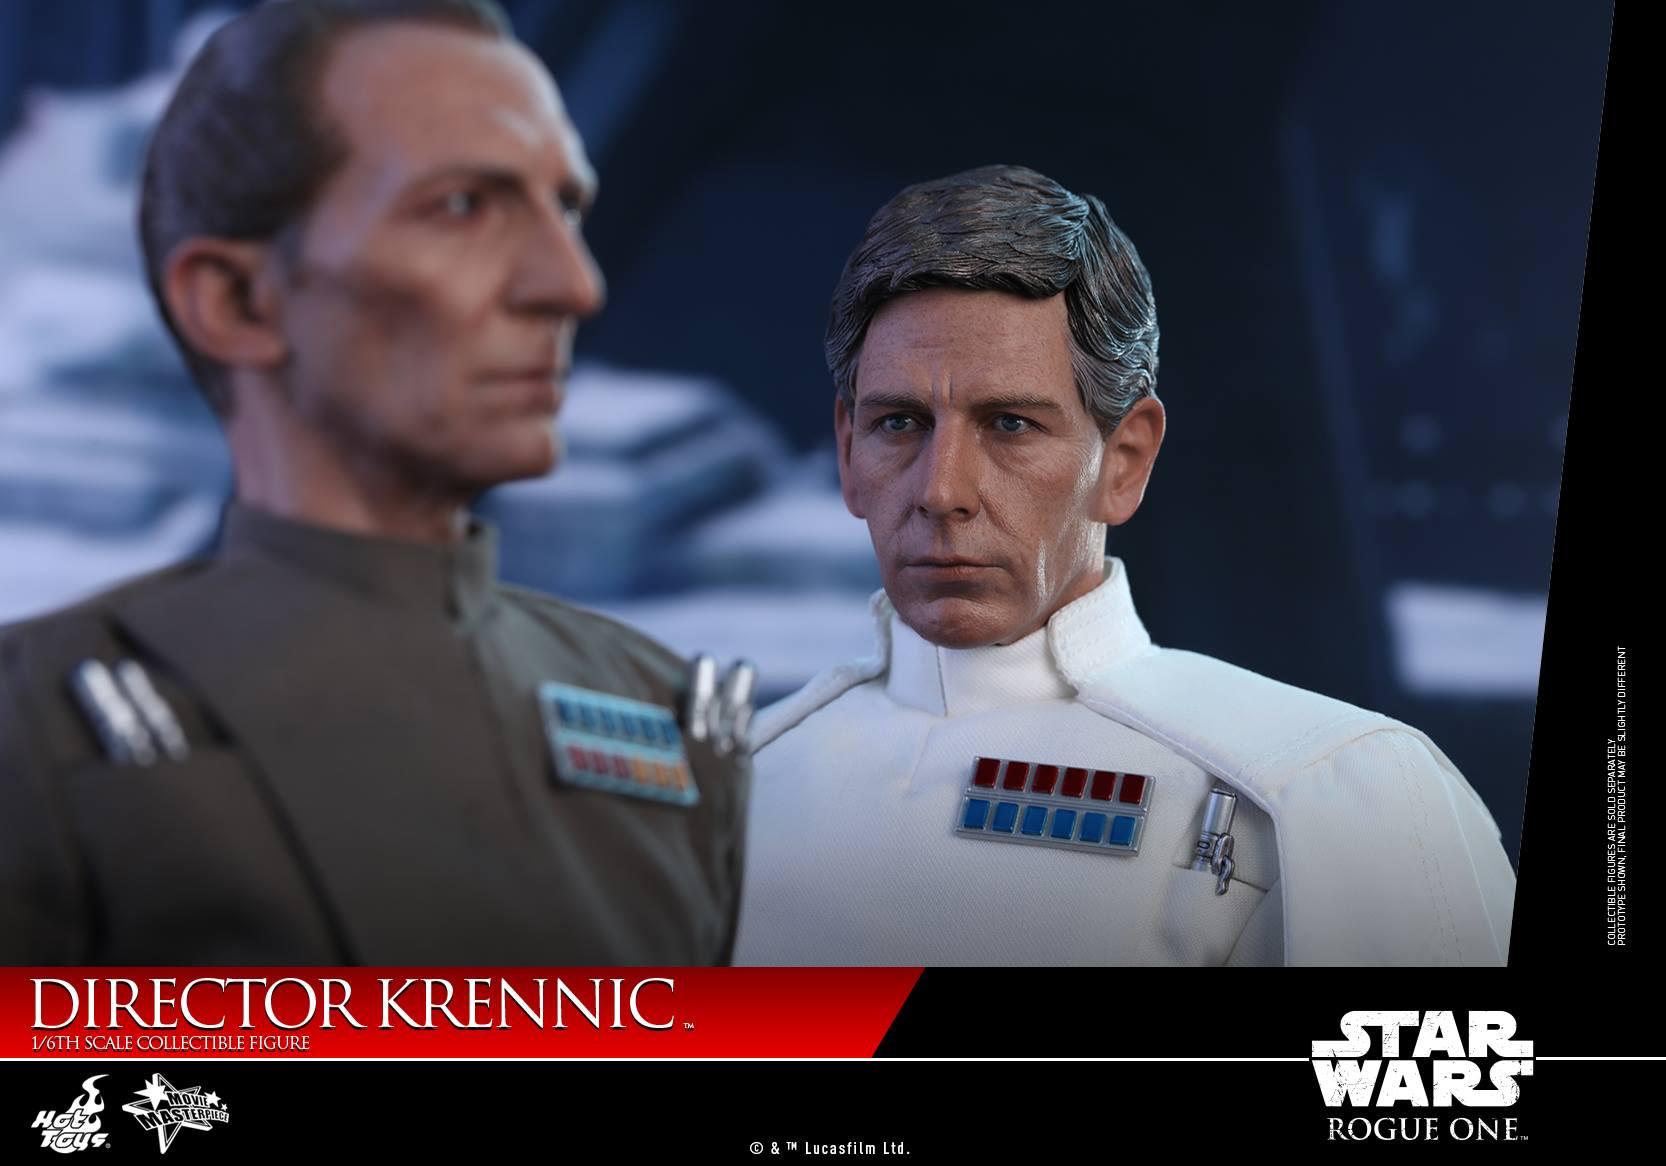 Star Wars Hot Toys Director Krennic 5